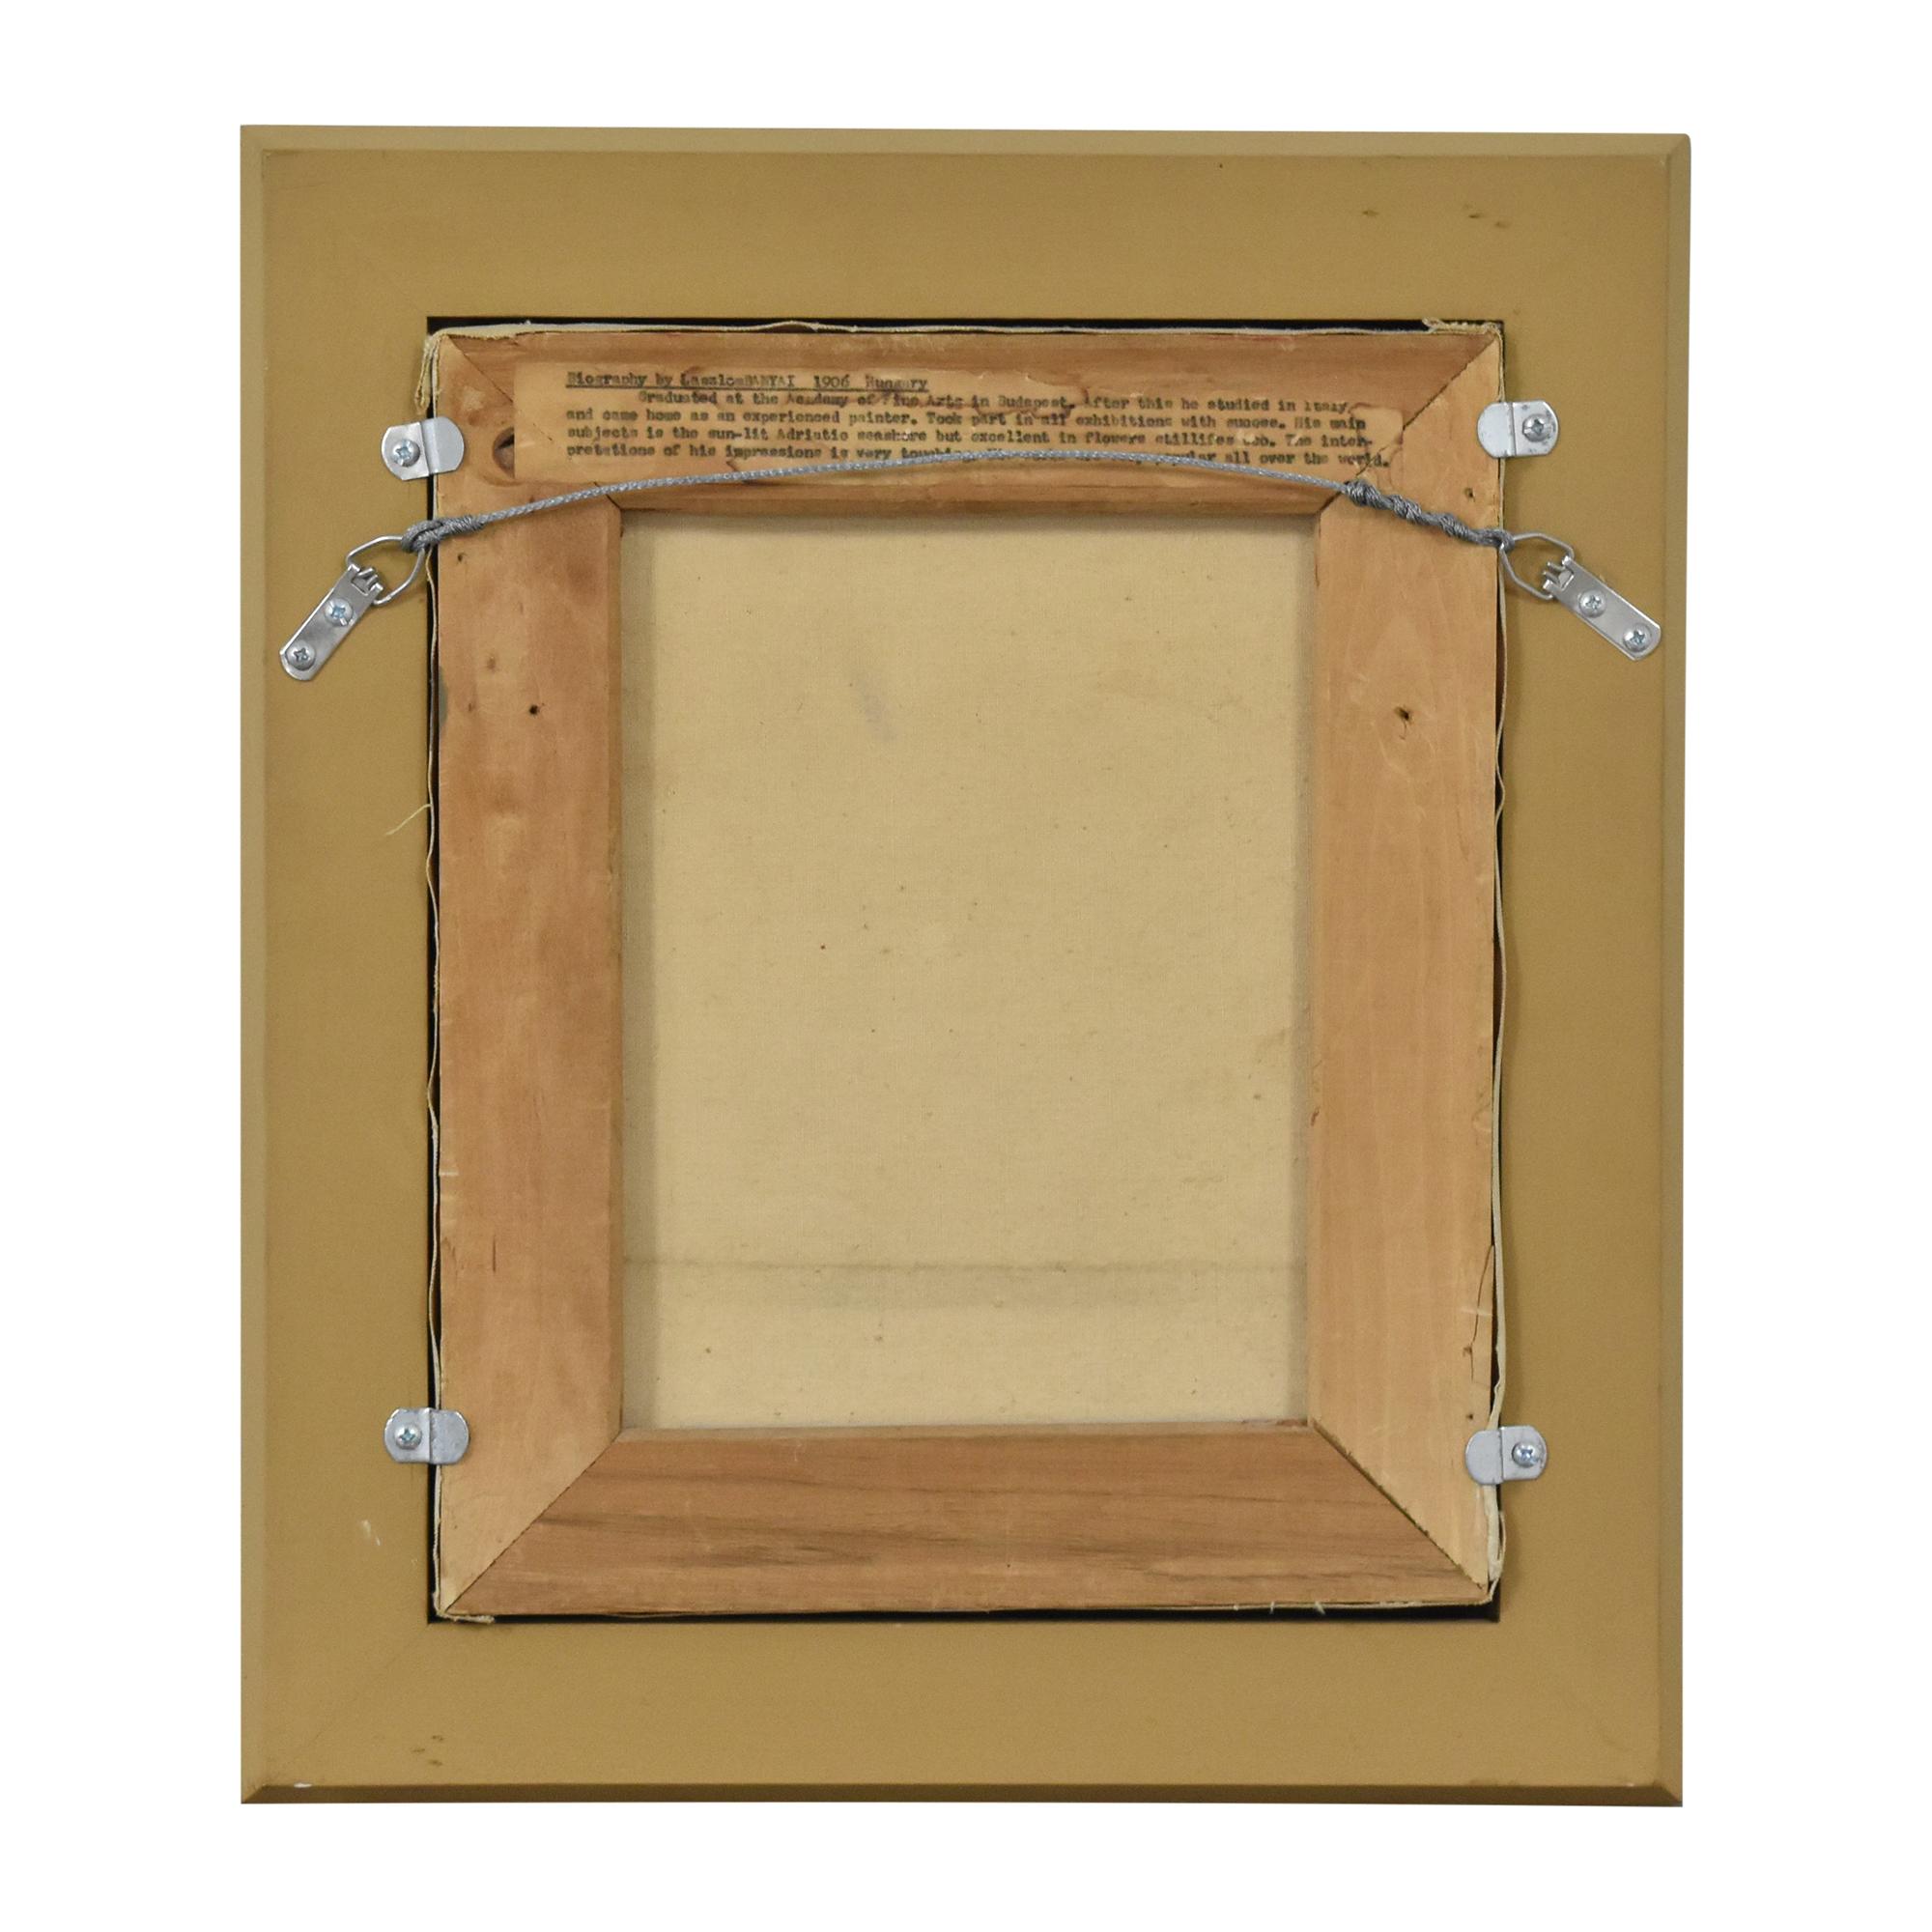 Artmax Artmax Framed Wall Art discount